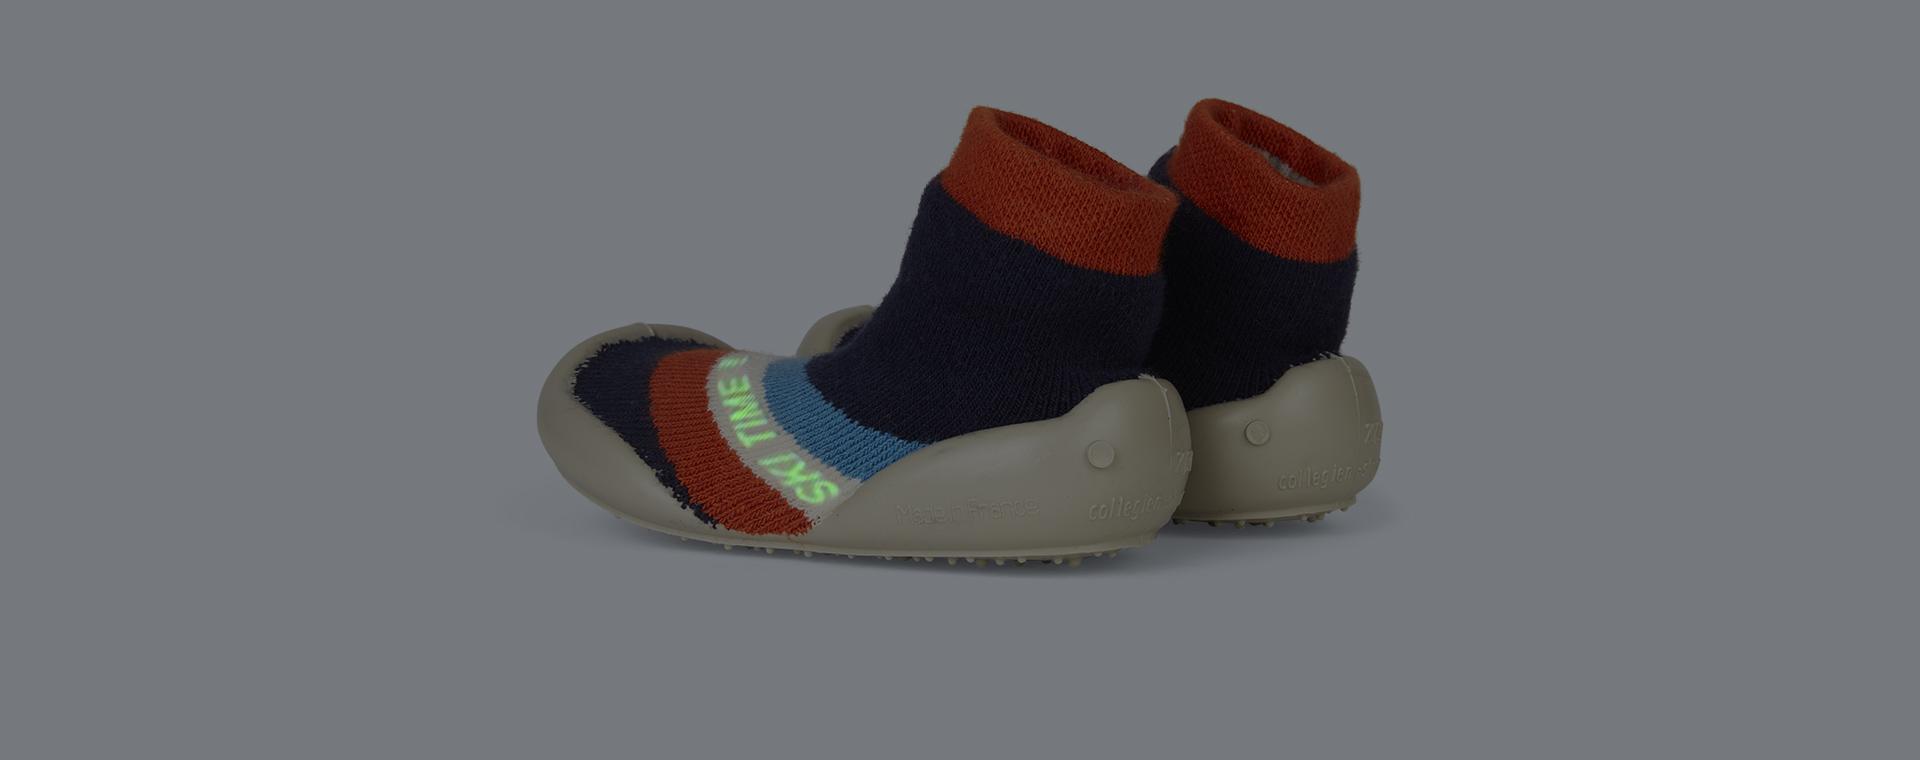 Navy Collegien Chamonix Phospho Slipper Socks